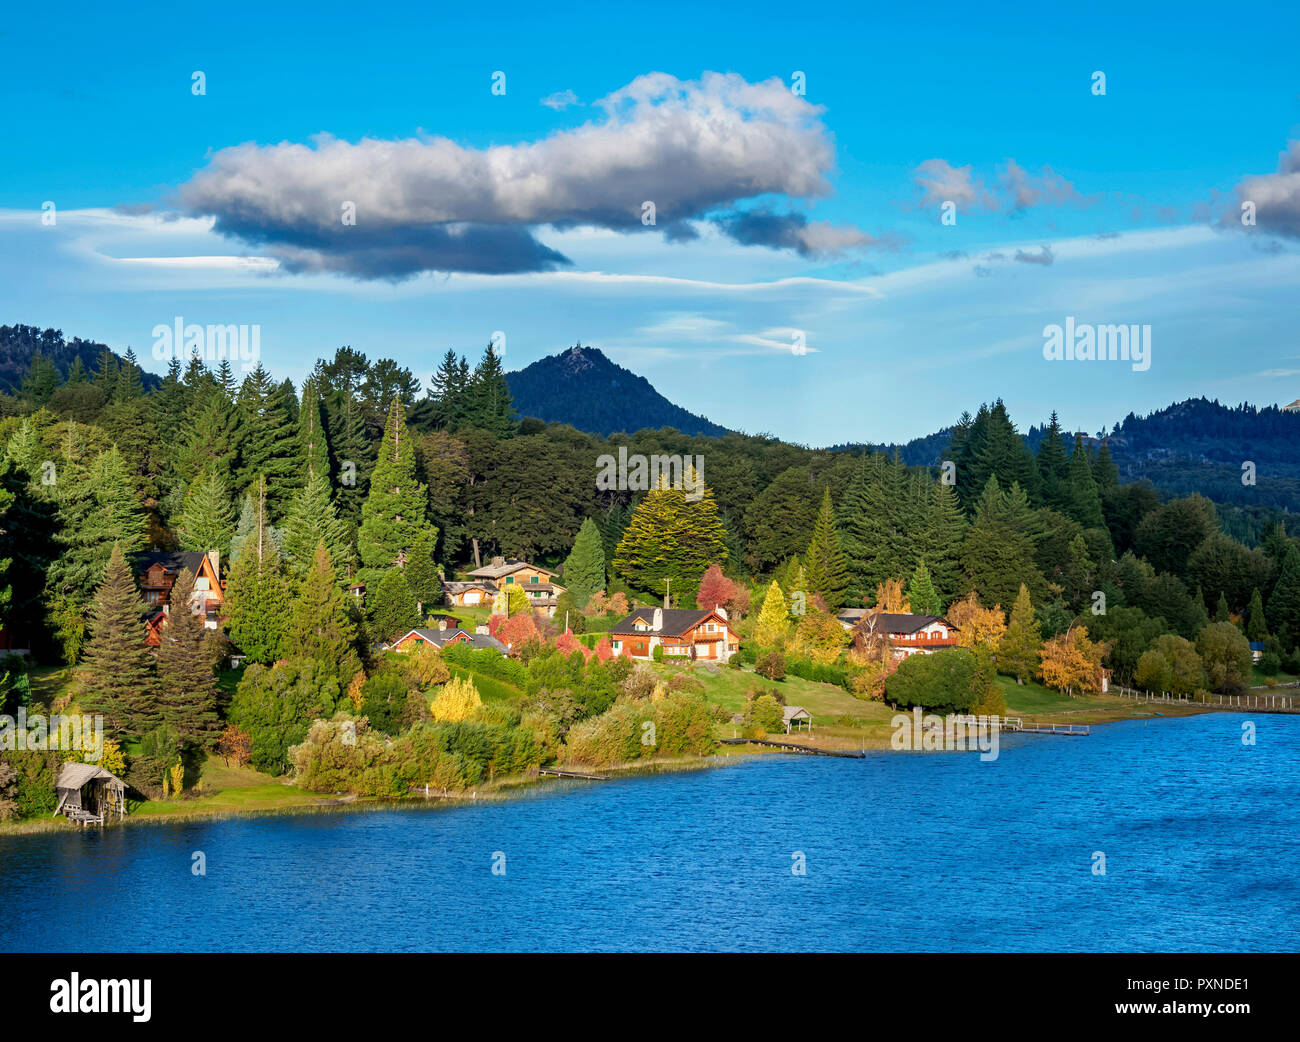 Lake Moreno, Llao Llao, Nahuel Huapi National Park, Rio Negro Province, Argentina - Stock Image